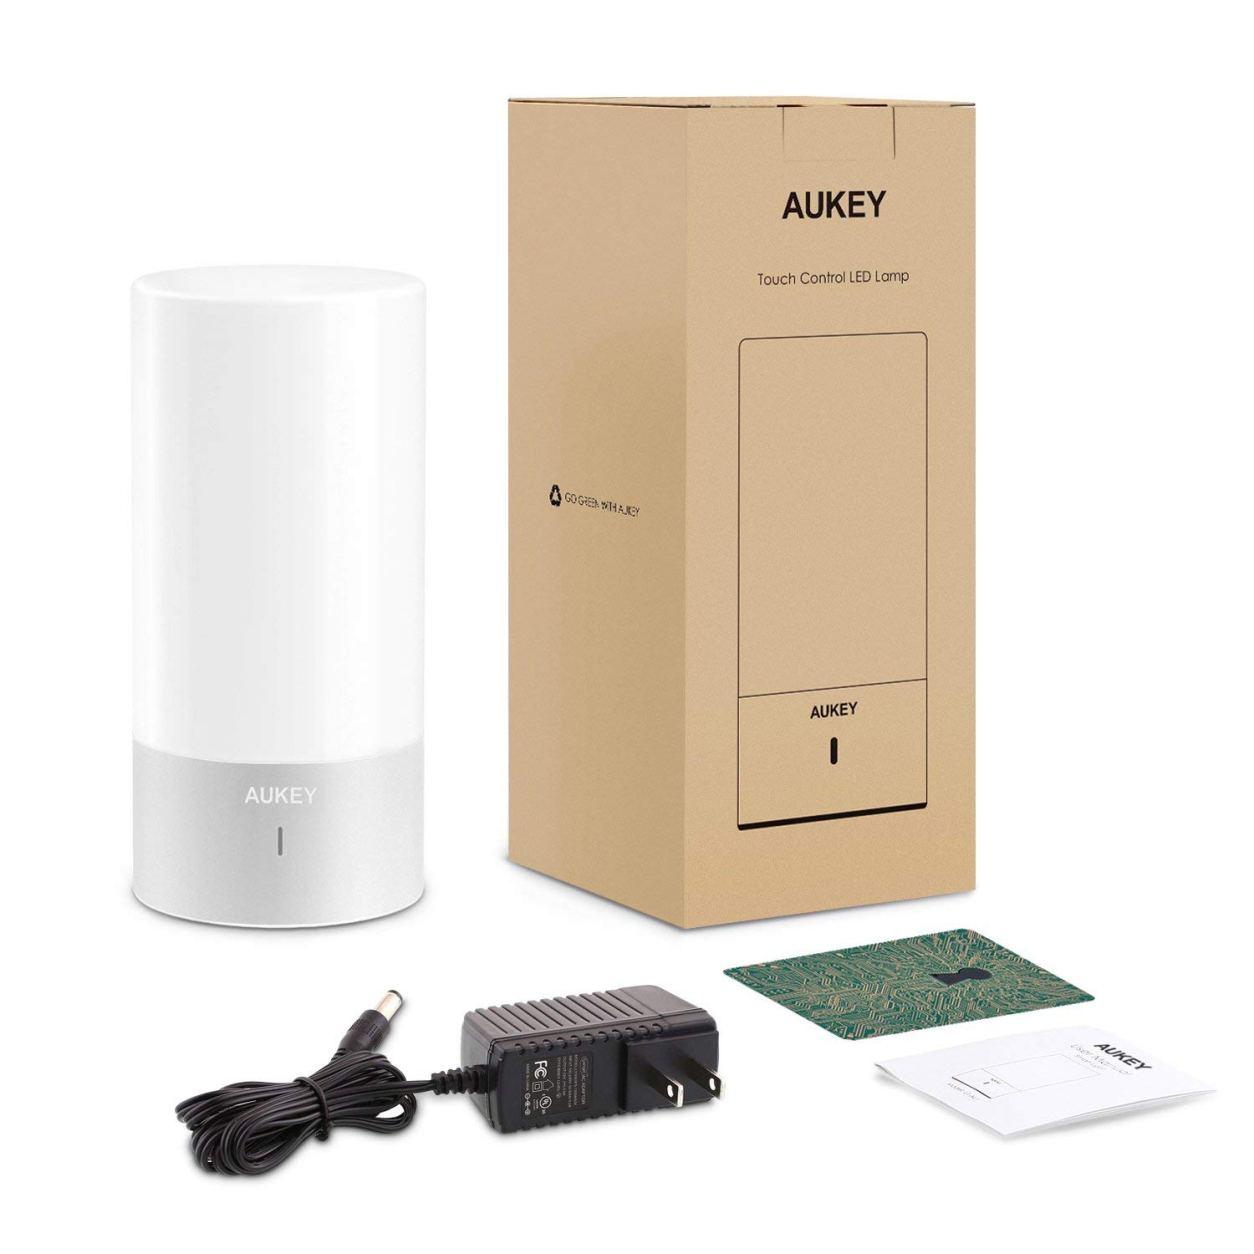 Aukey LT-T6